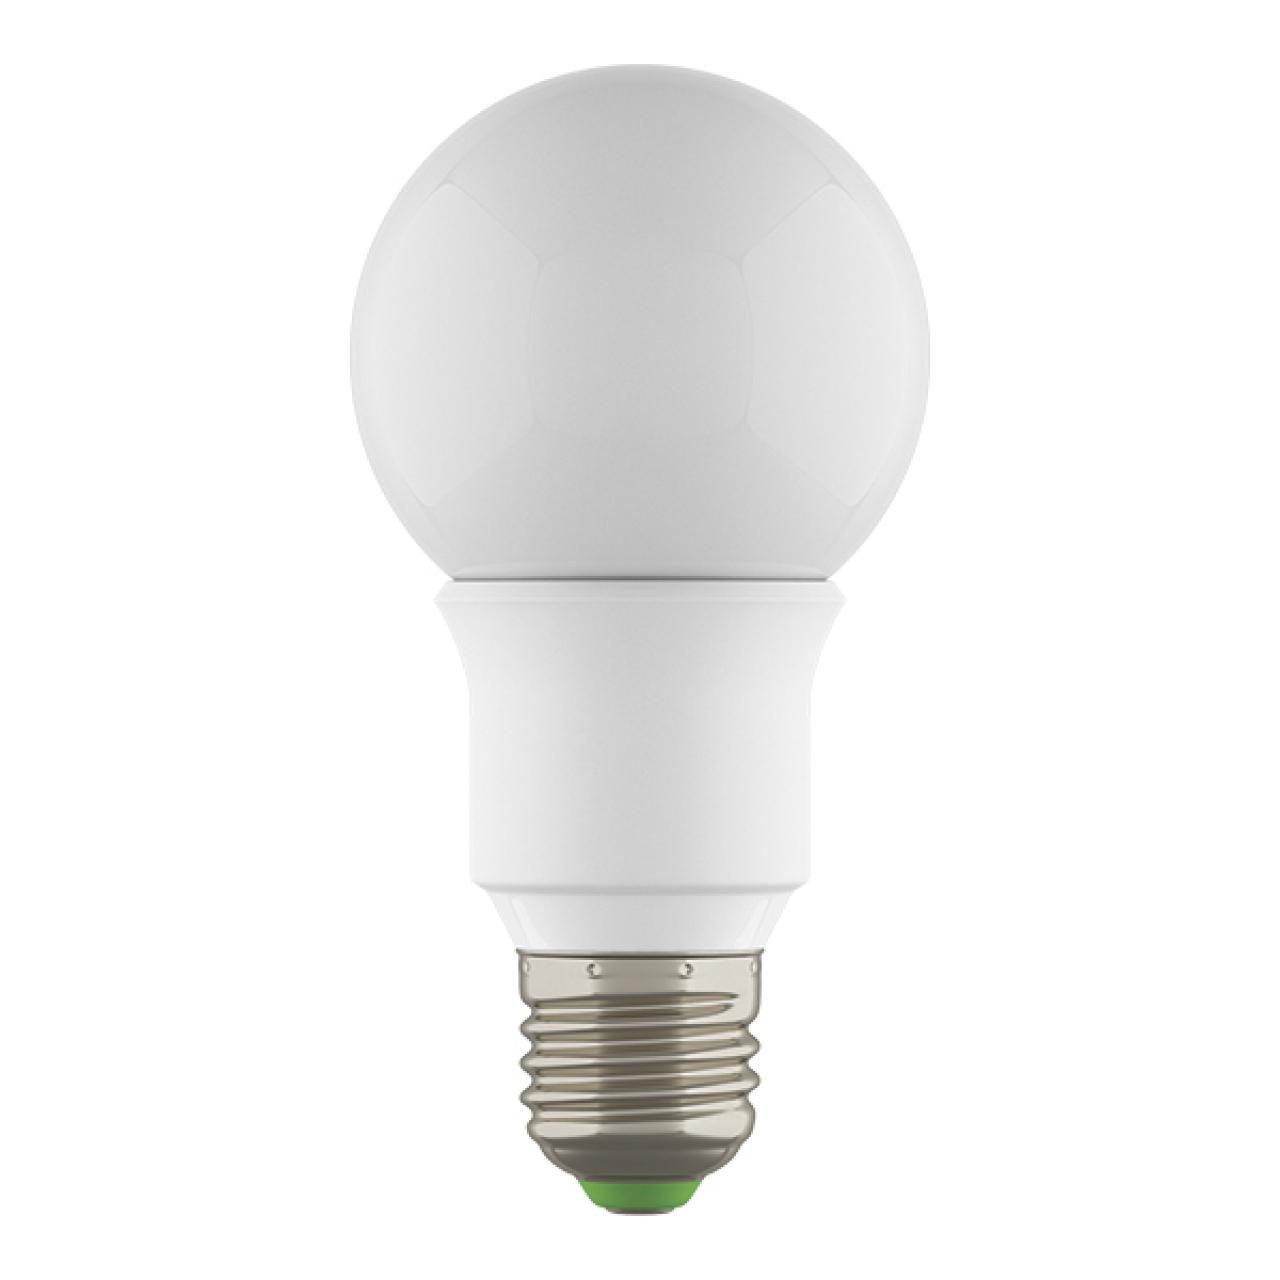 Лампа LED 220V A60 E27 6W=60W 520LM 360G WH 4000K 20000H DIMM Lightstar 931004